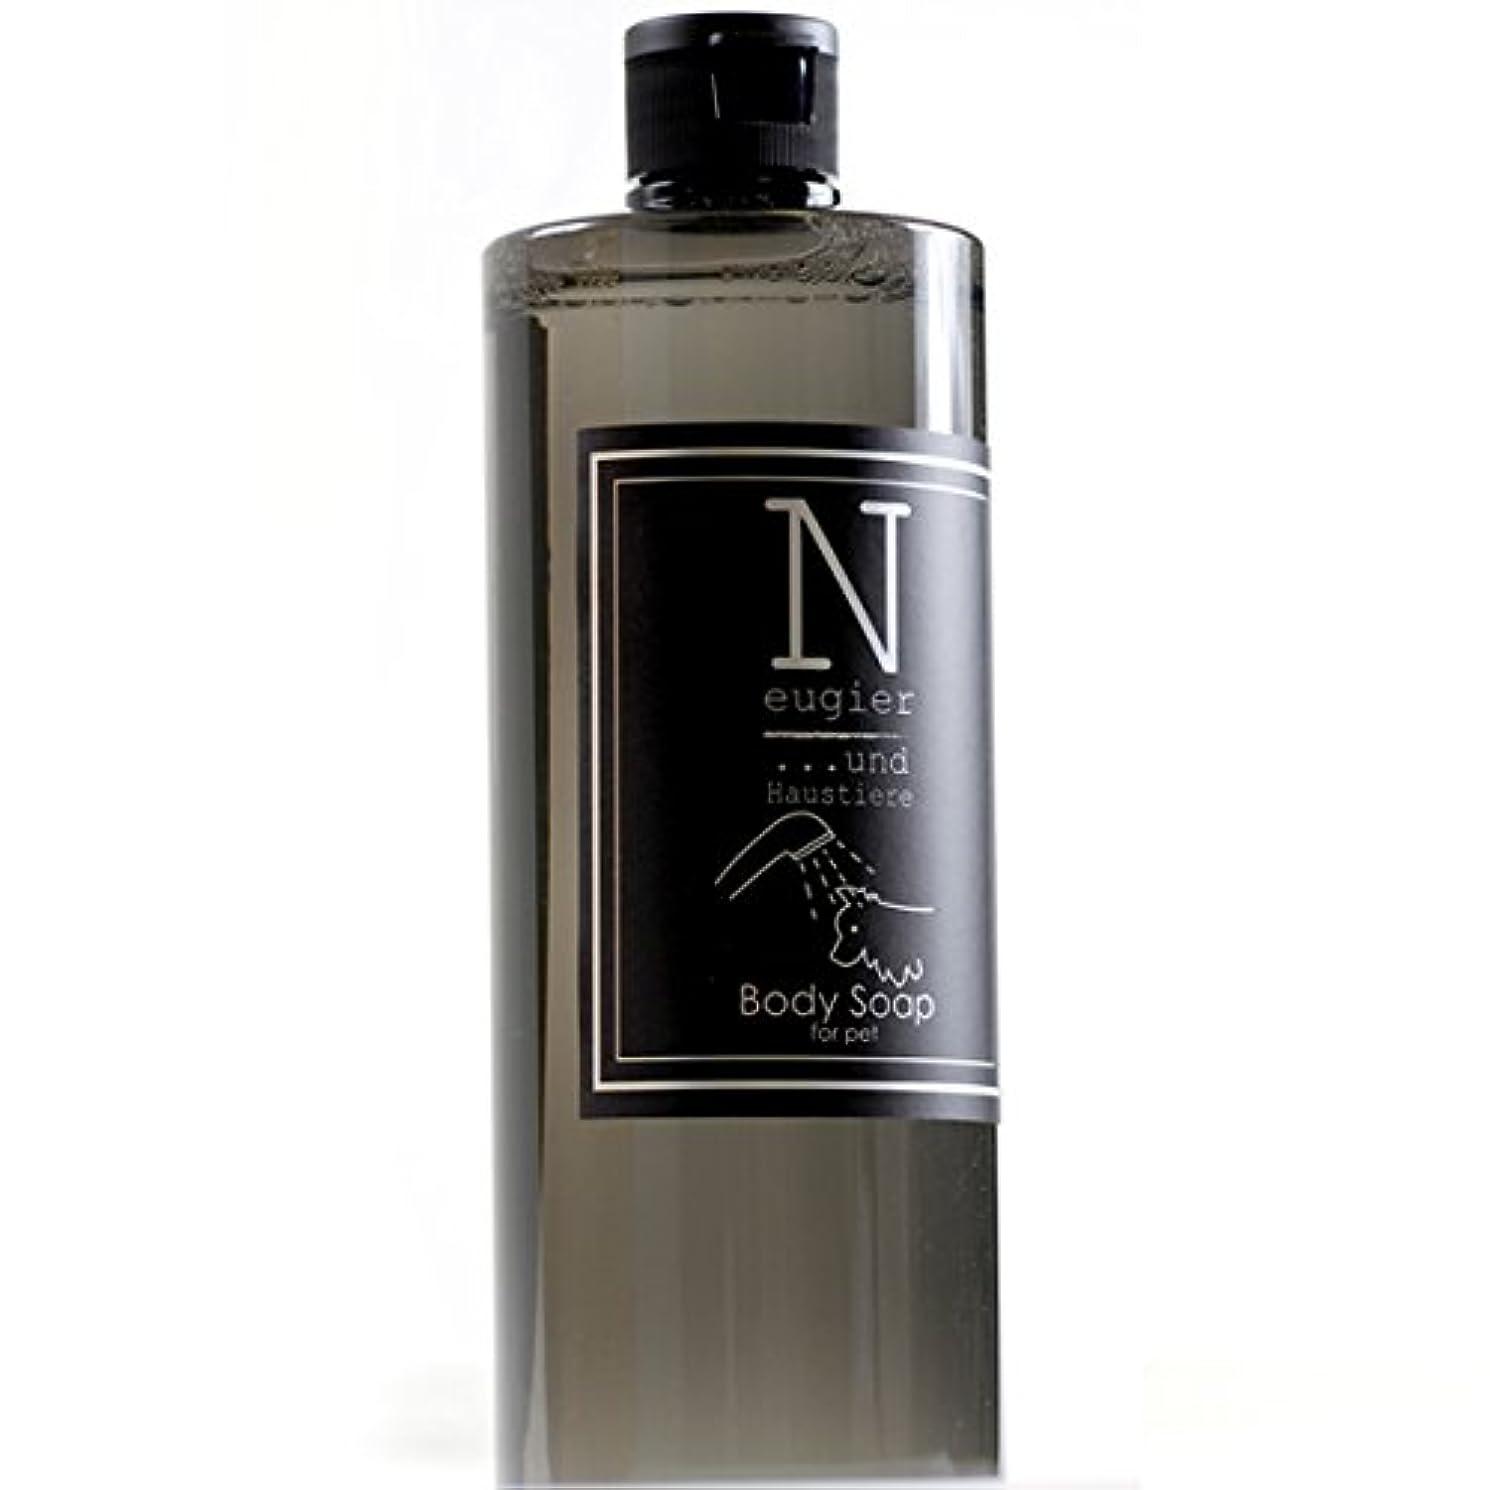 Neugier ケアシリーズ body Soap (ボディーソープ/ペットシャンプー) (500)